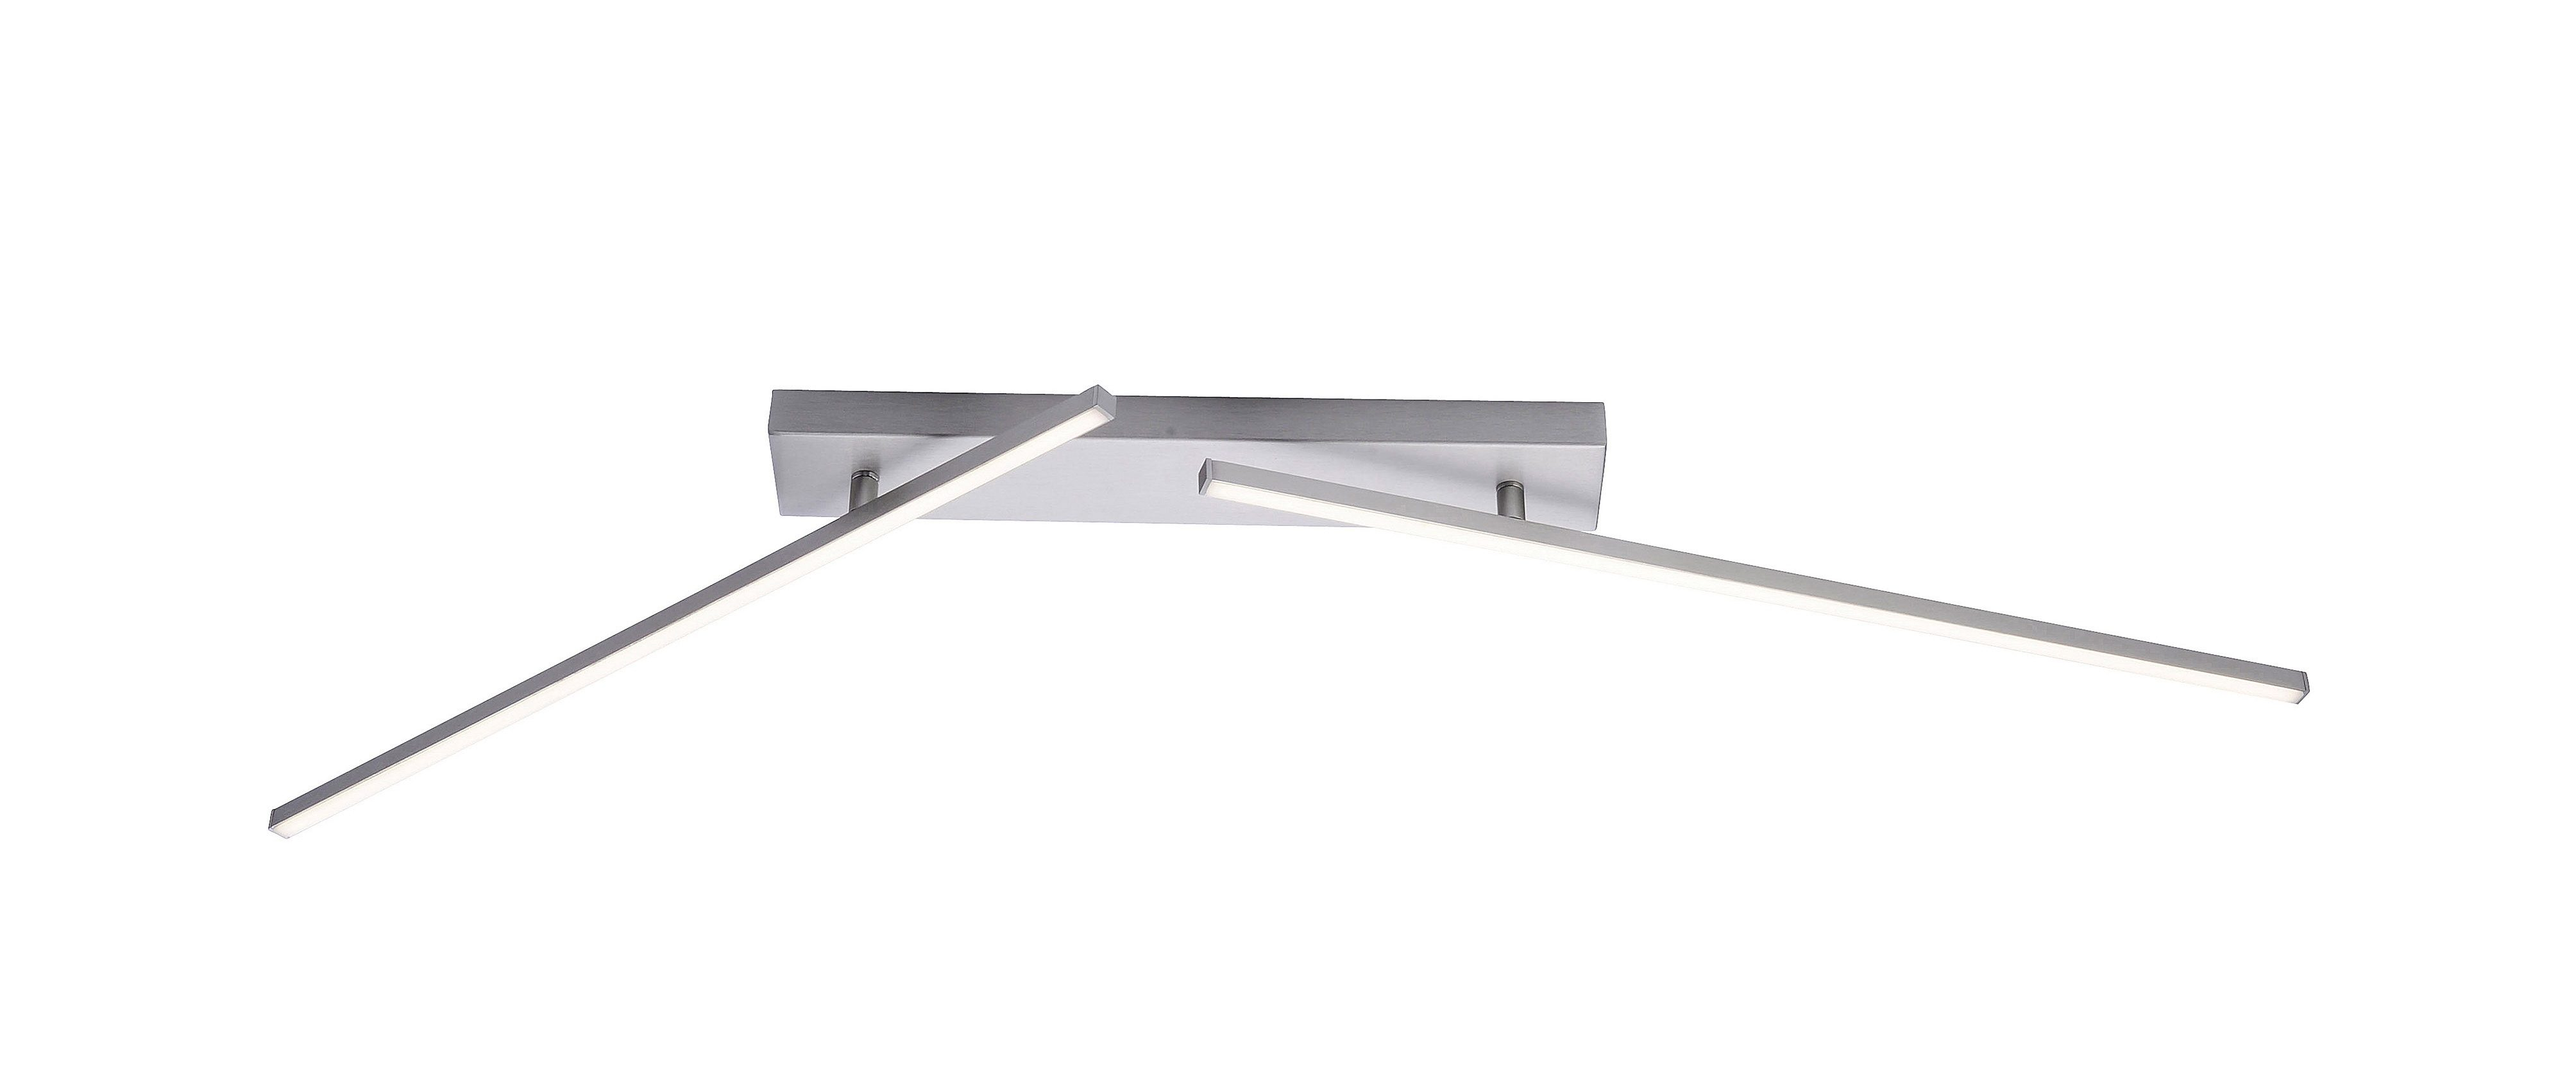 Paul Neuhaus LED-Deckenleuchte, 2flg., »INIGO«